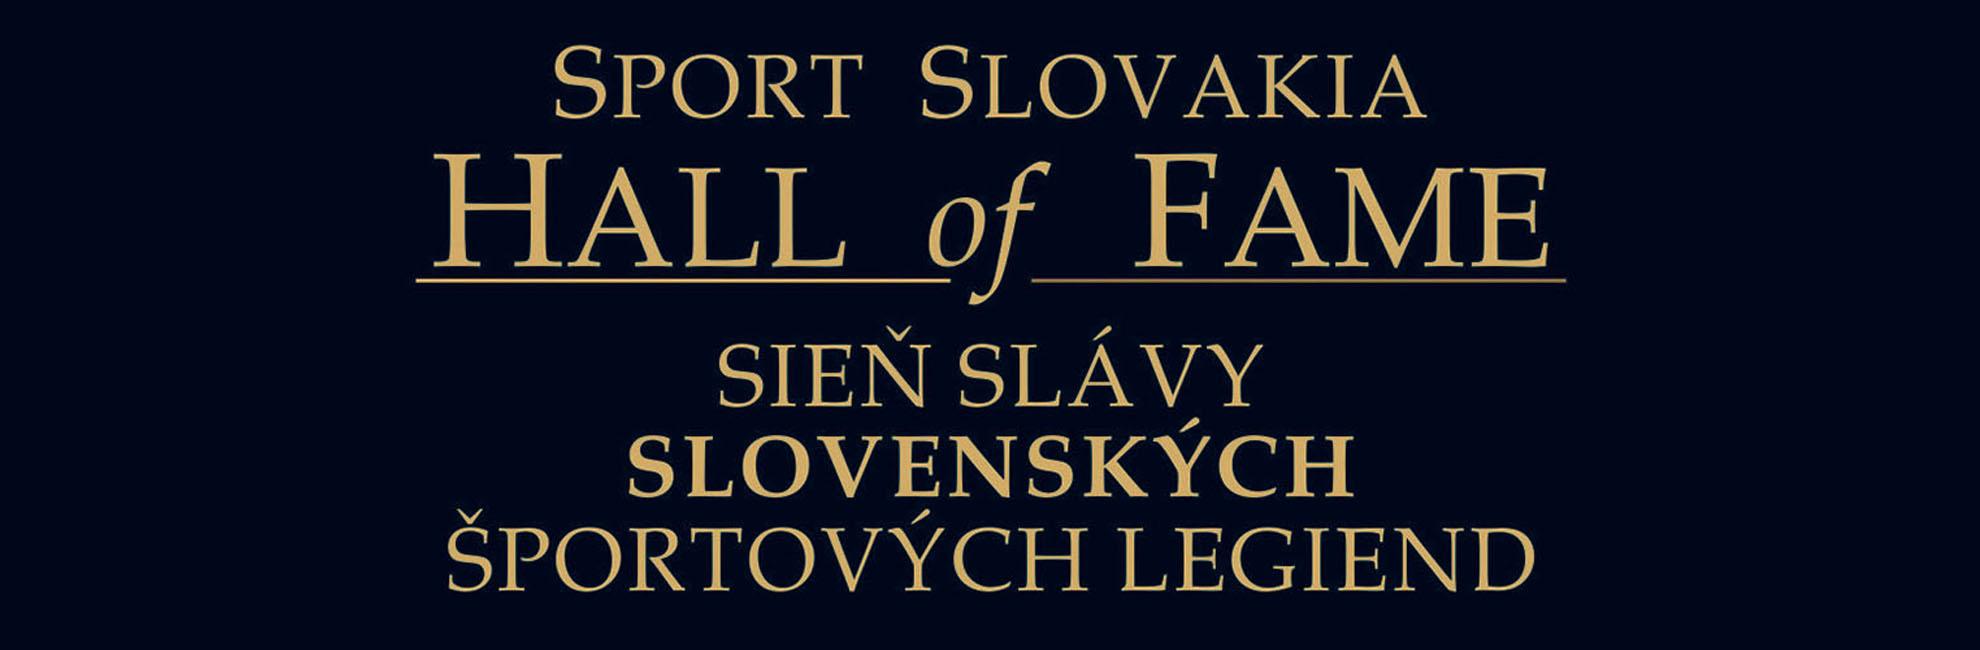 Sport Slovakia Hall of Fame